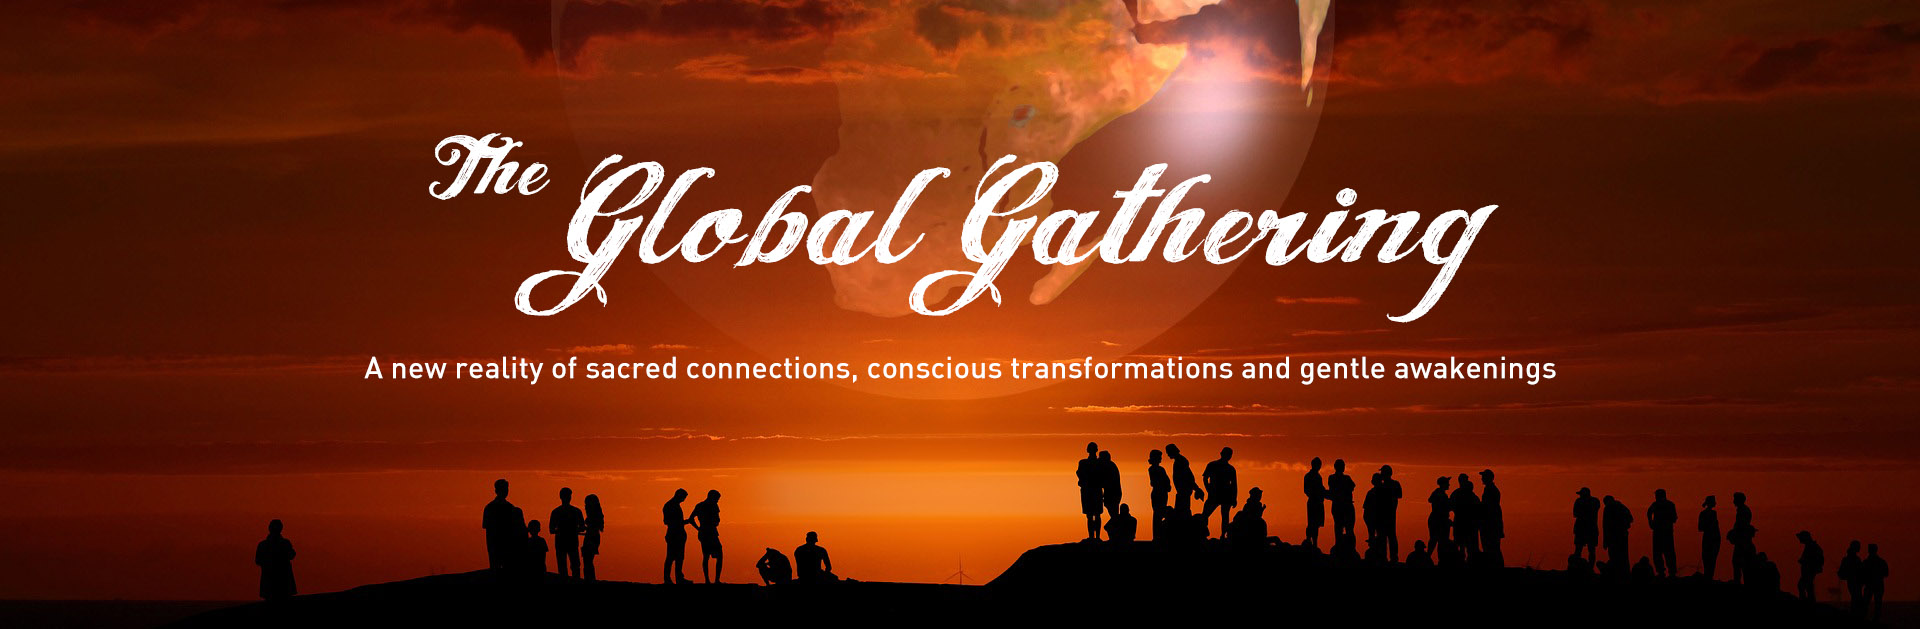 Global Gathering - Speaker Page 1